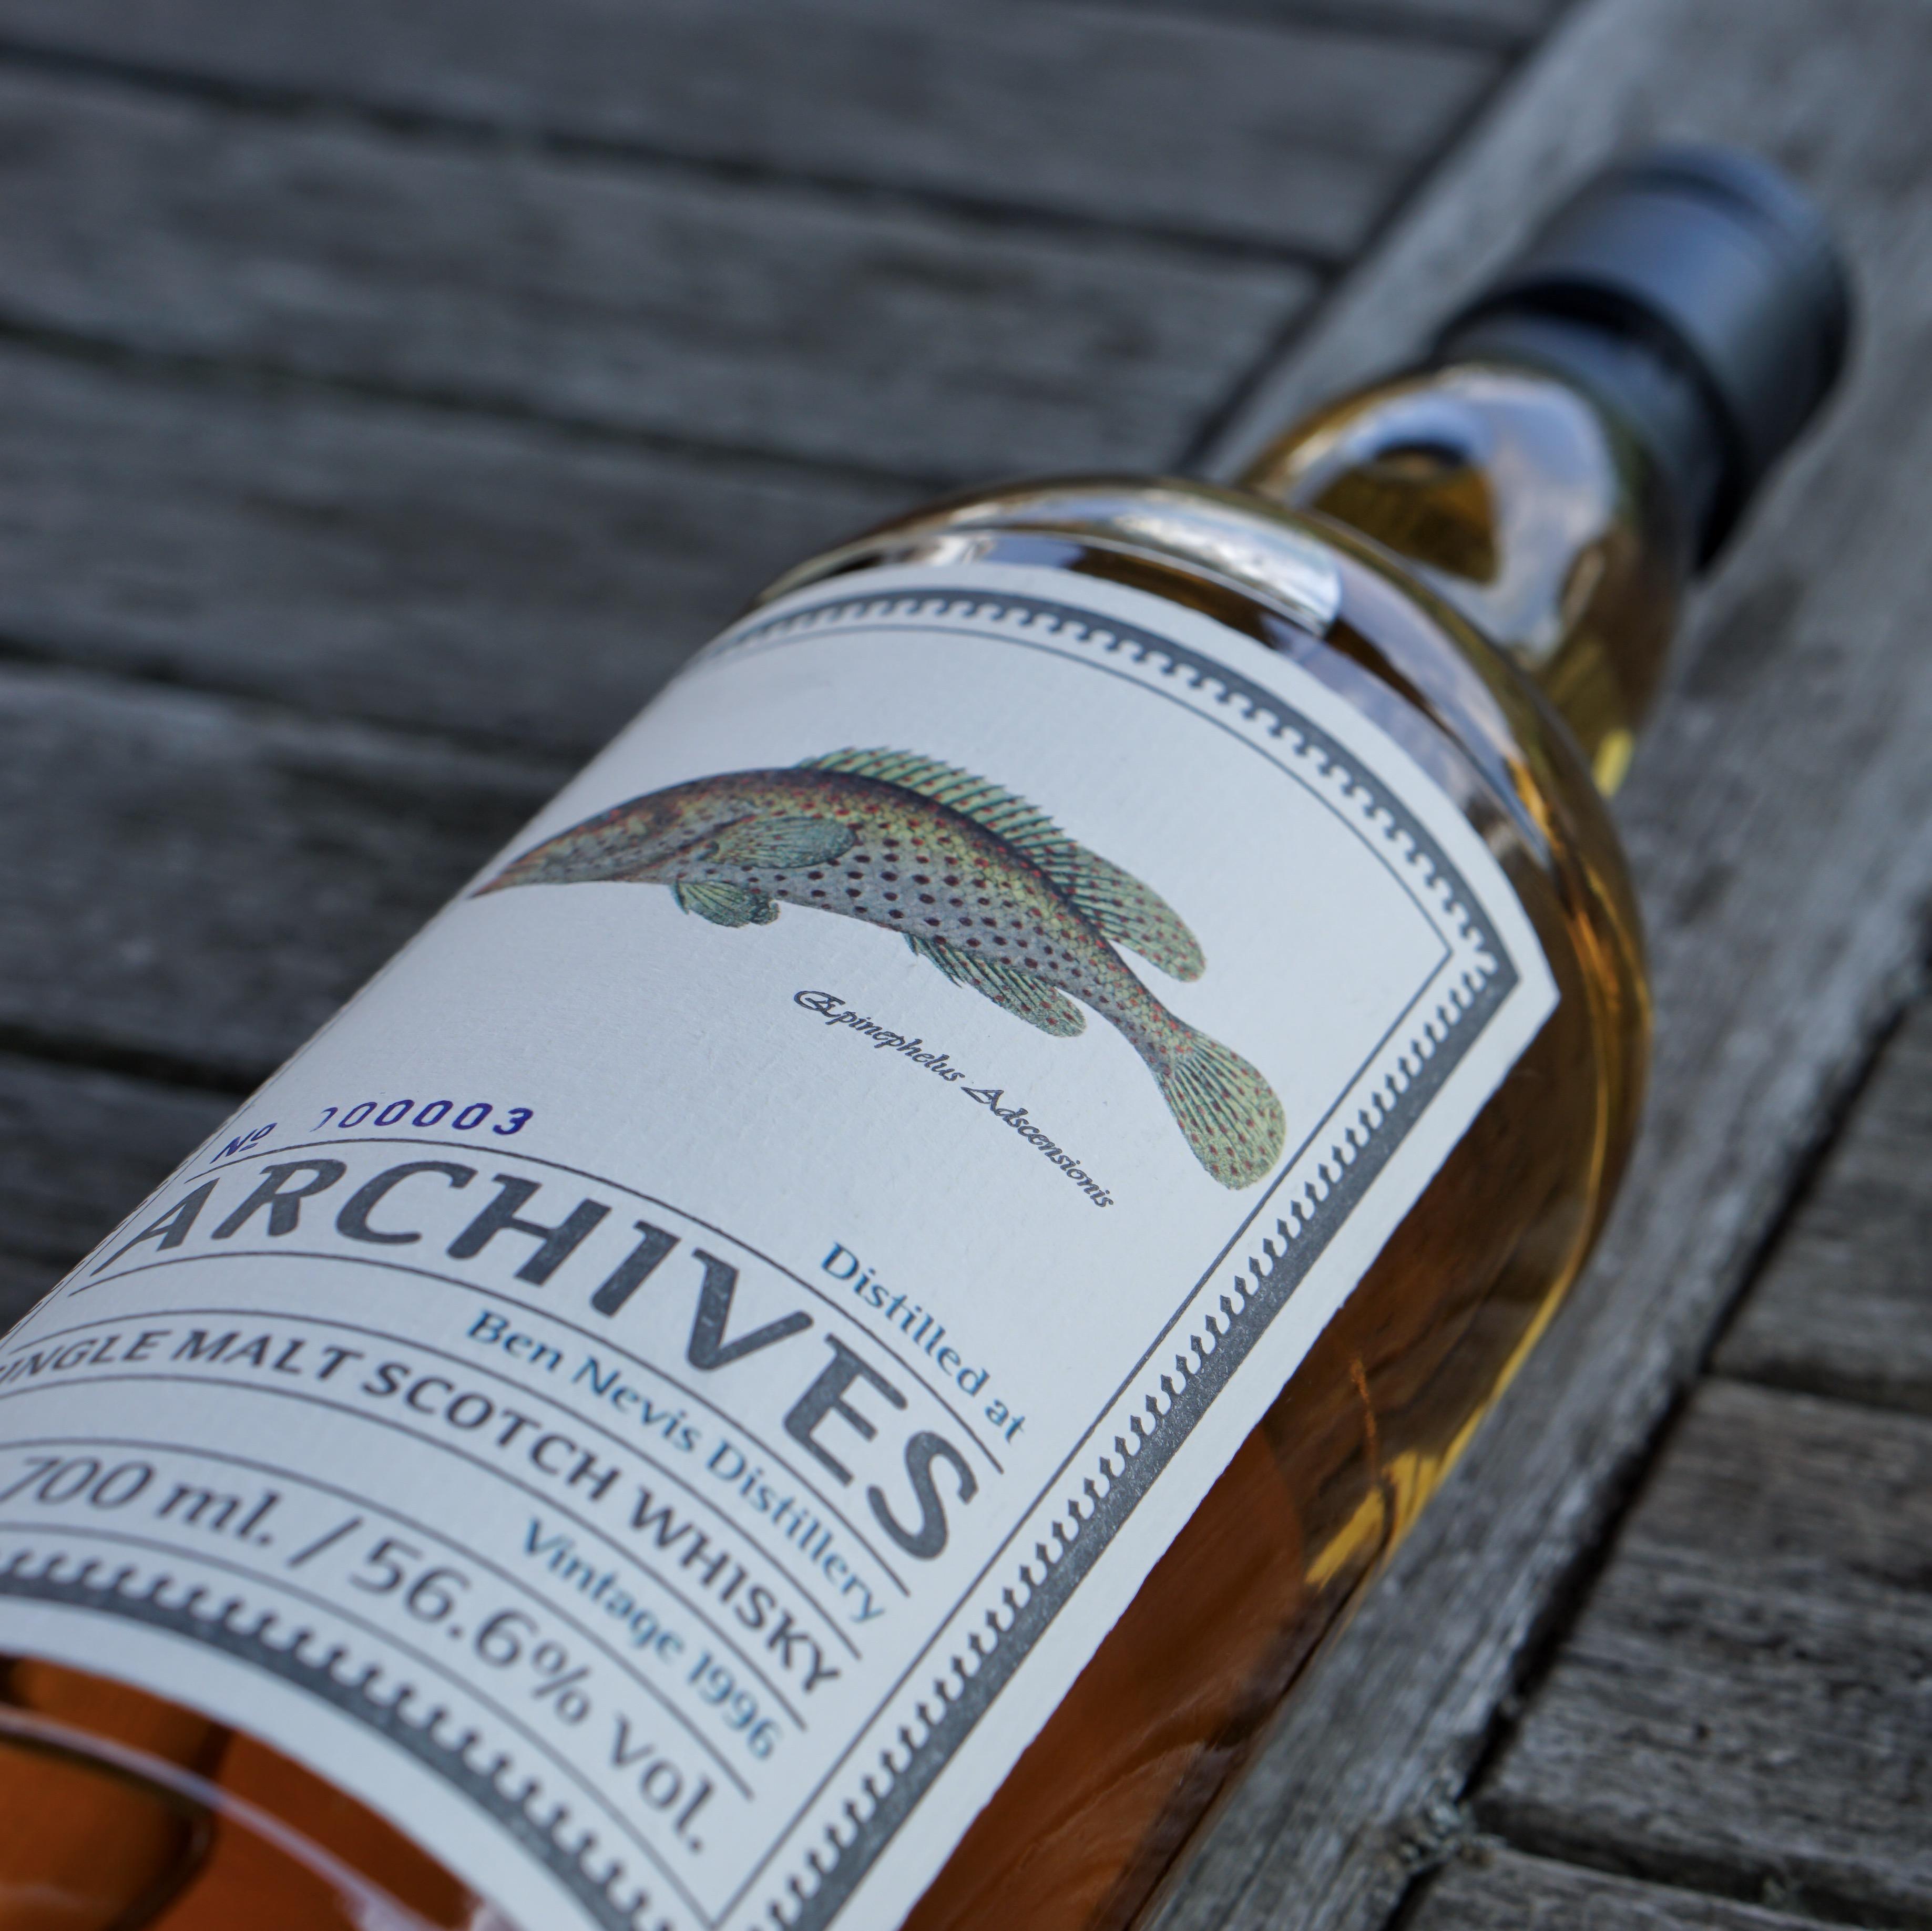 http://archiveswhisky.com/wp-content/uploads/2018/07/4.-Ben-Nevis-1996.jpg